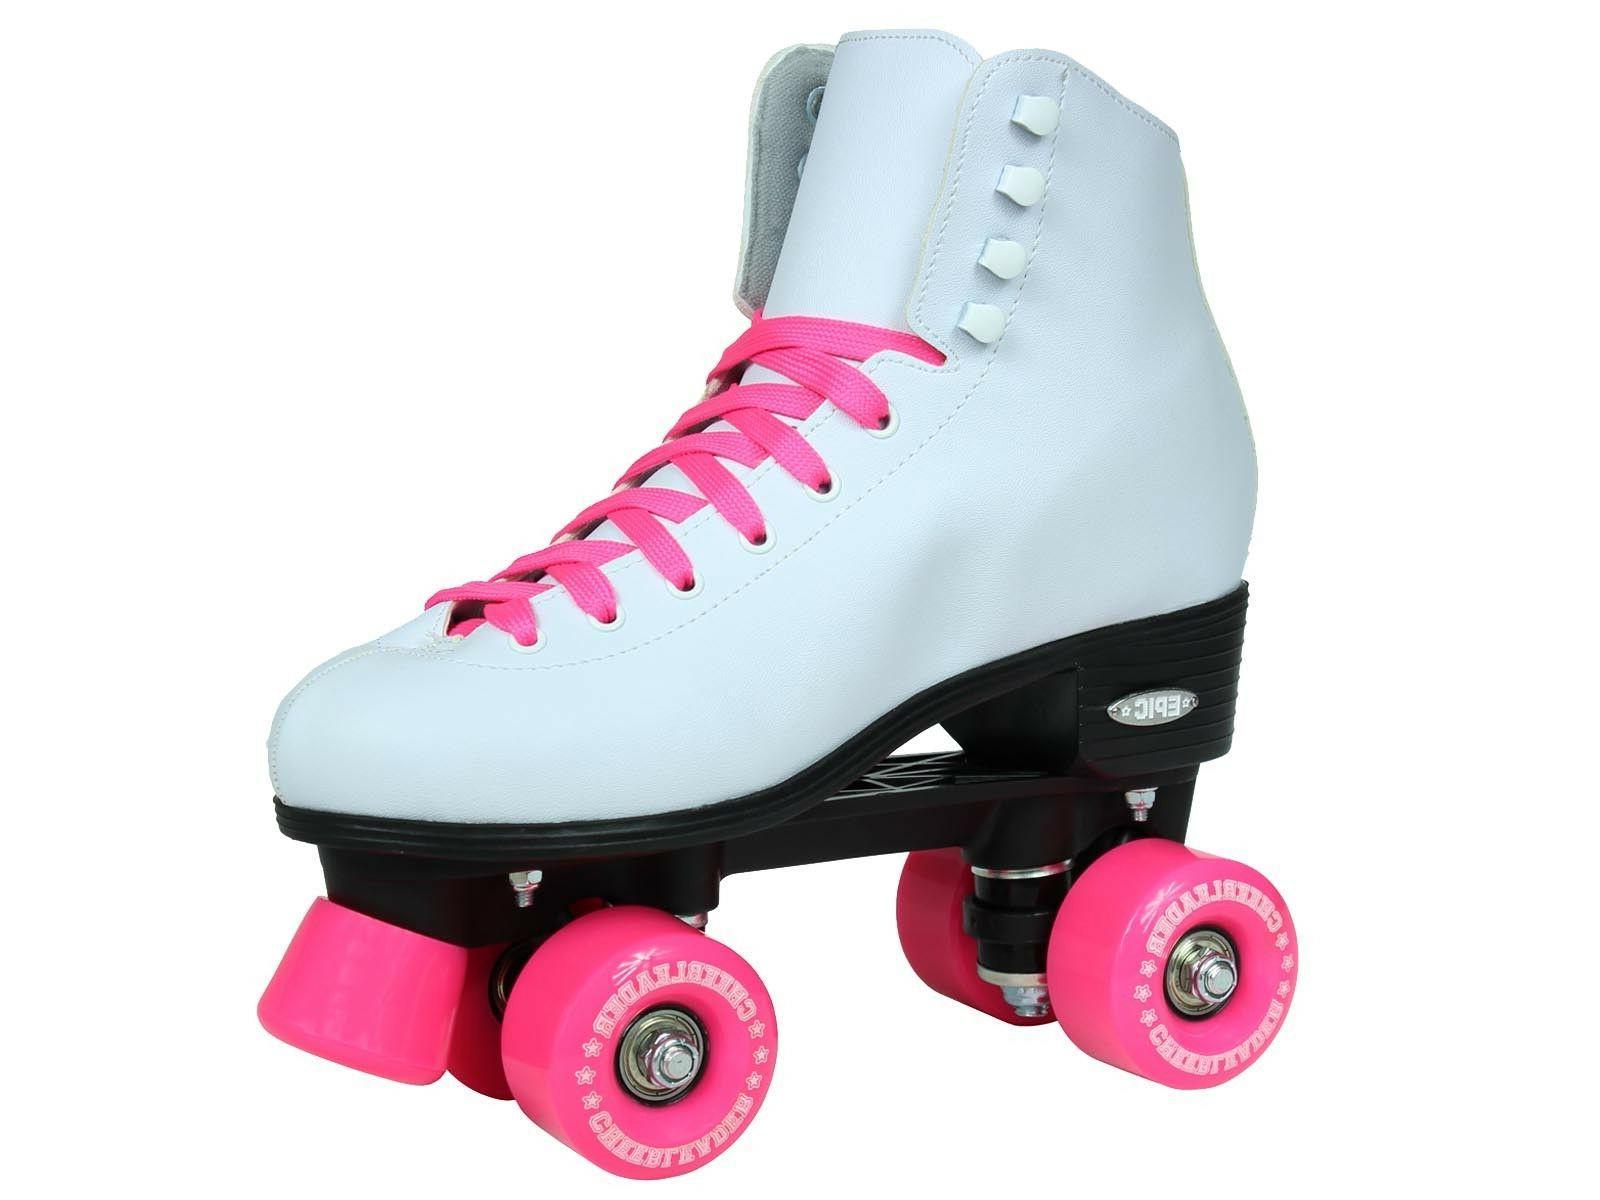 Epic Cheerleader & Pink High-Top Skates